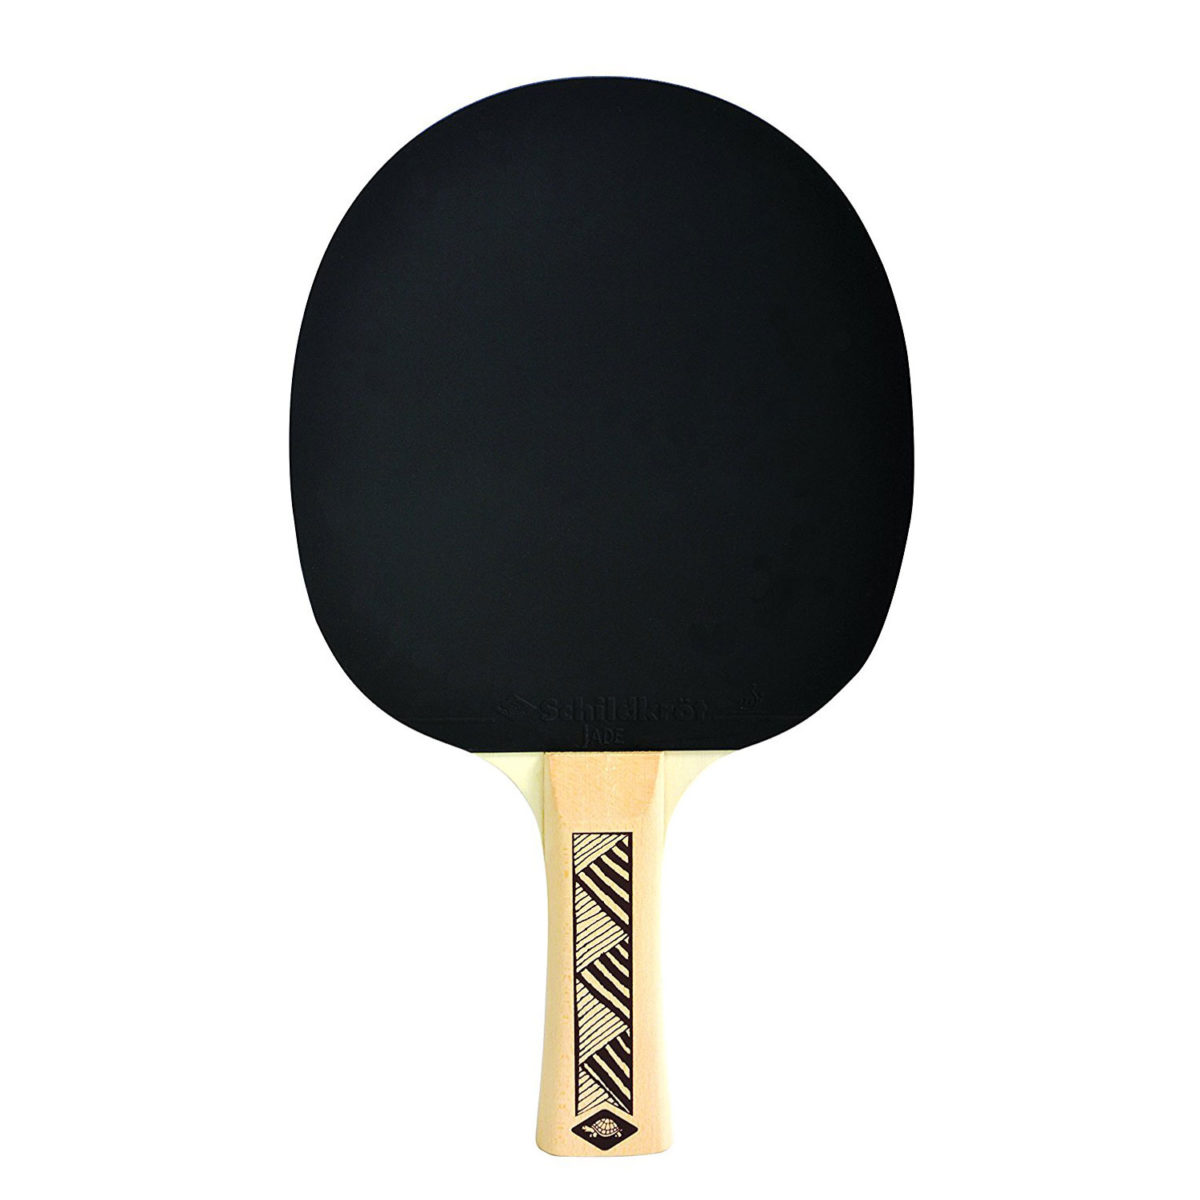 DONIC Champs 150 набор для настольного тенниса - 3